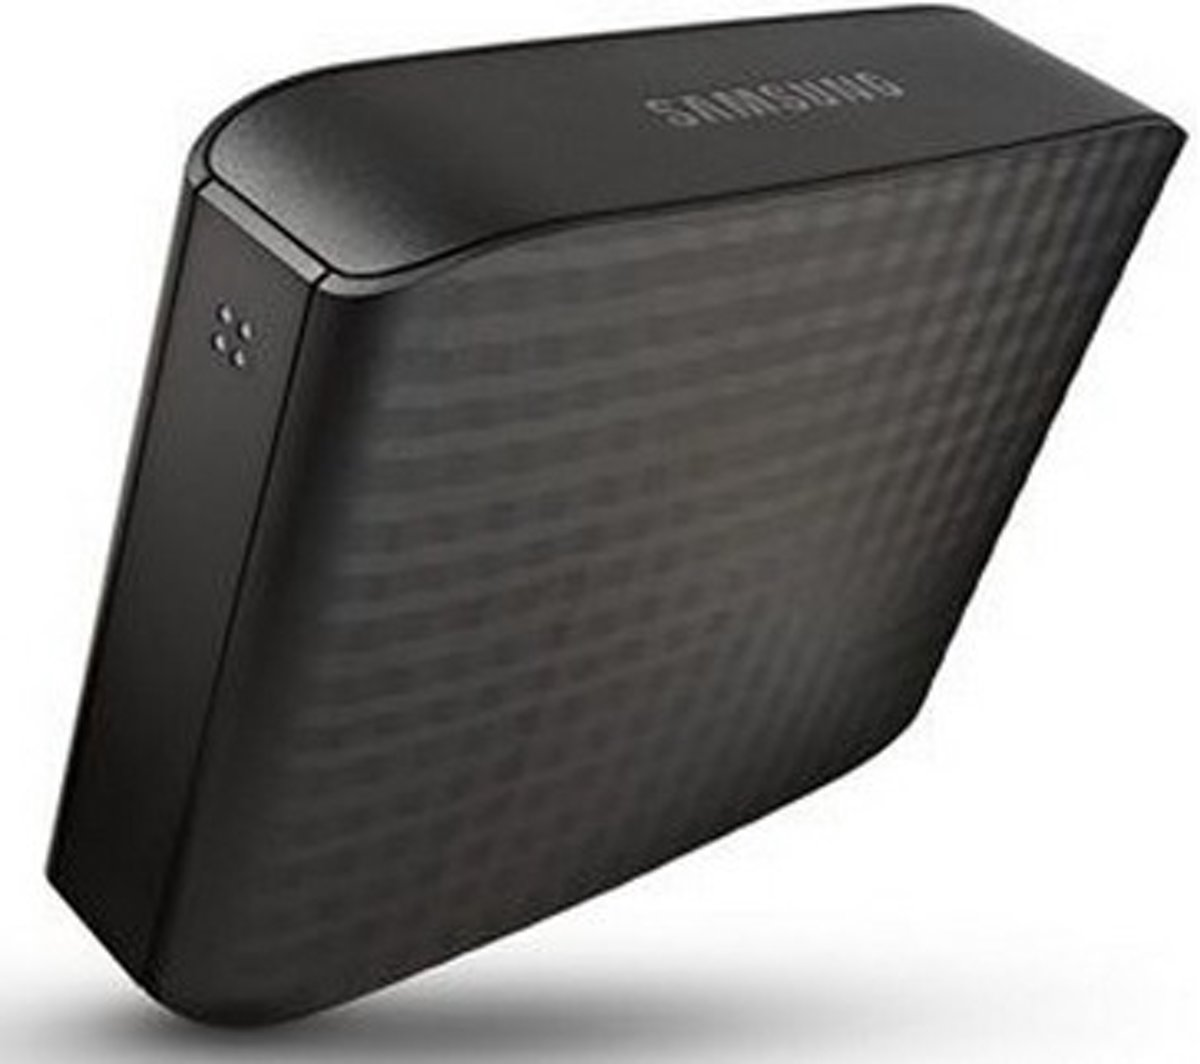 Samsung D3 Station - Externe harde schijf - 2TB - Zwart kopen